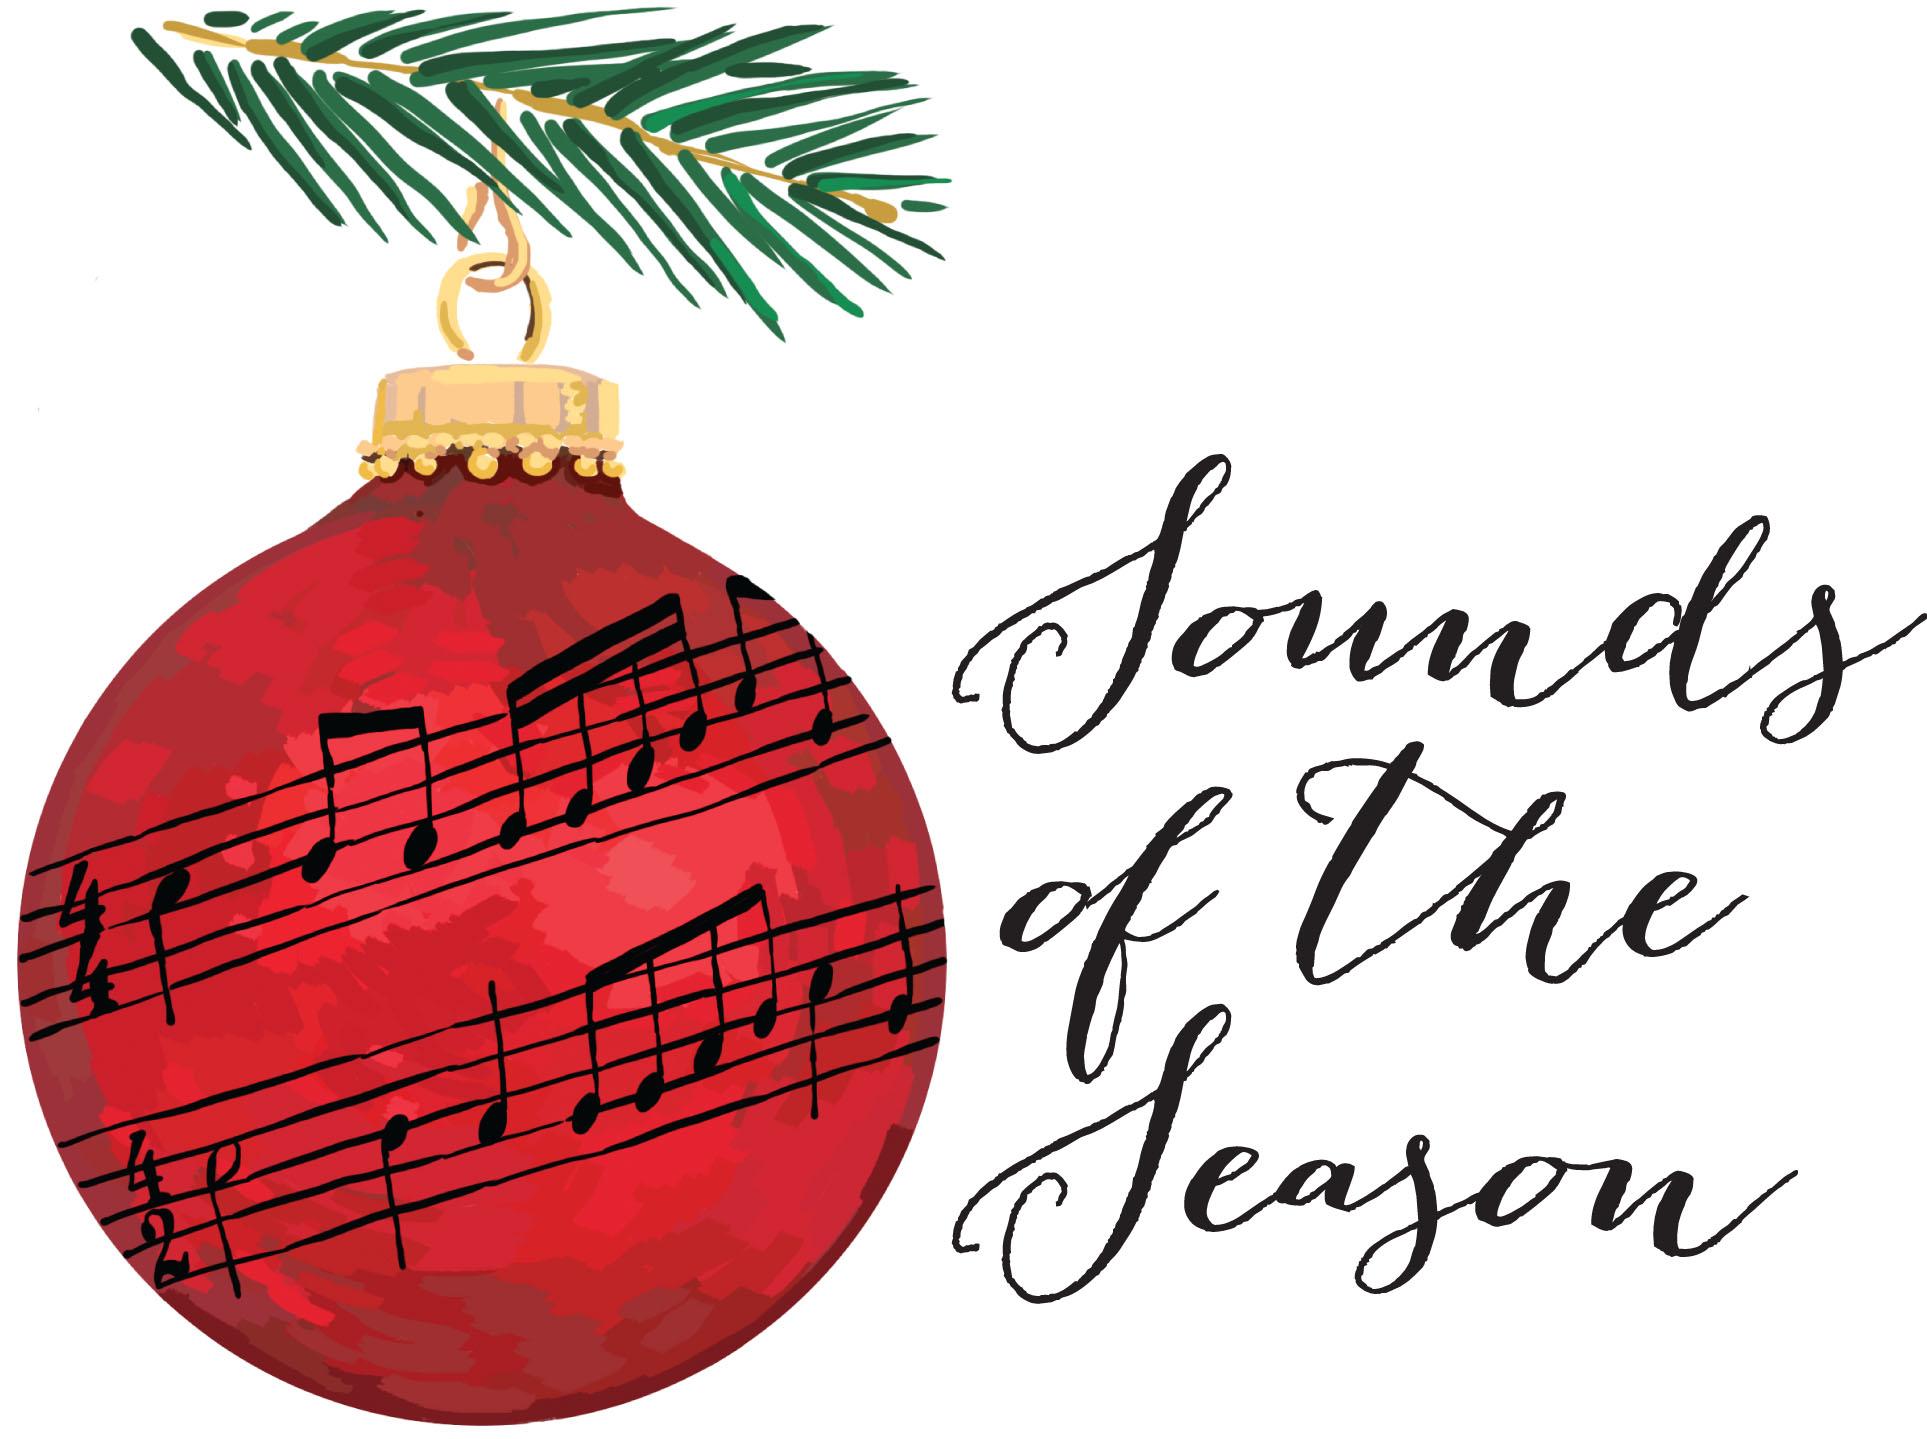 Musical clipart music program #9